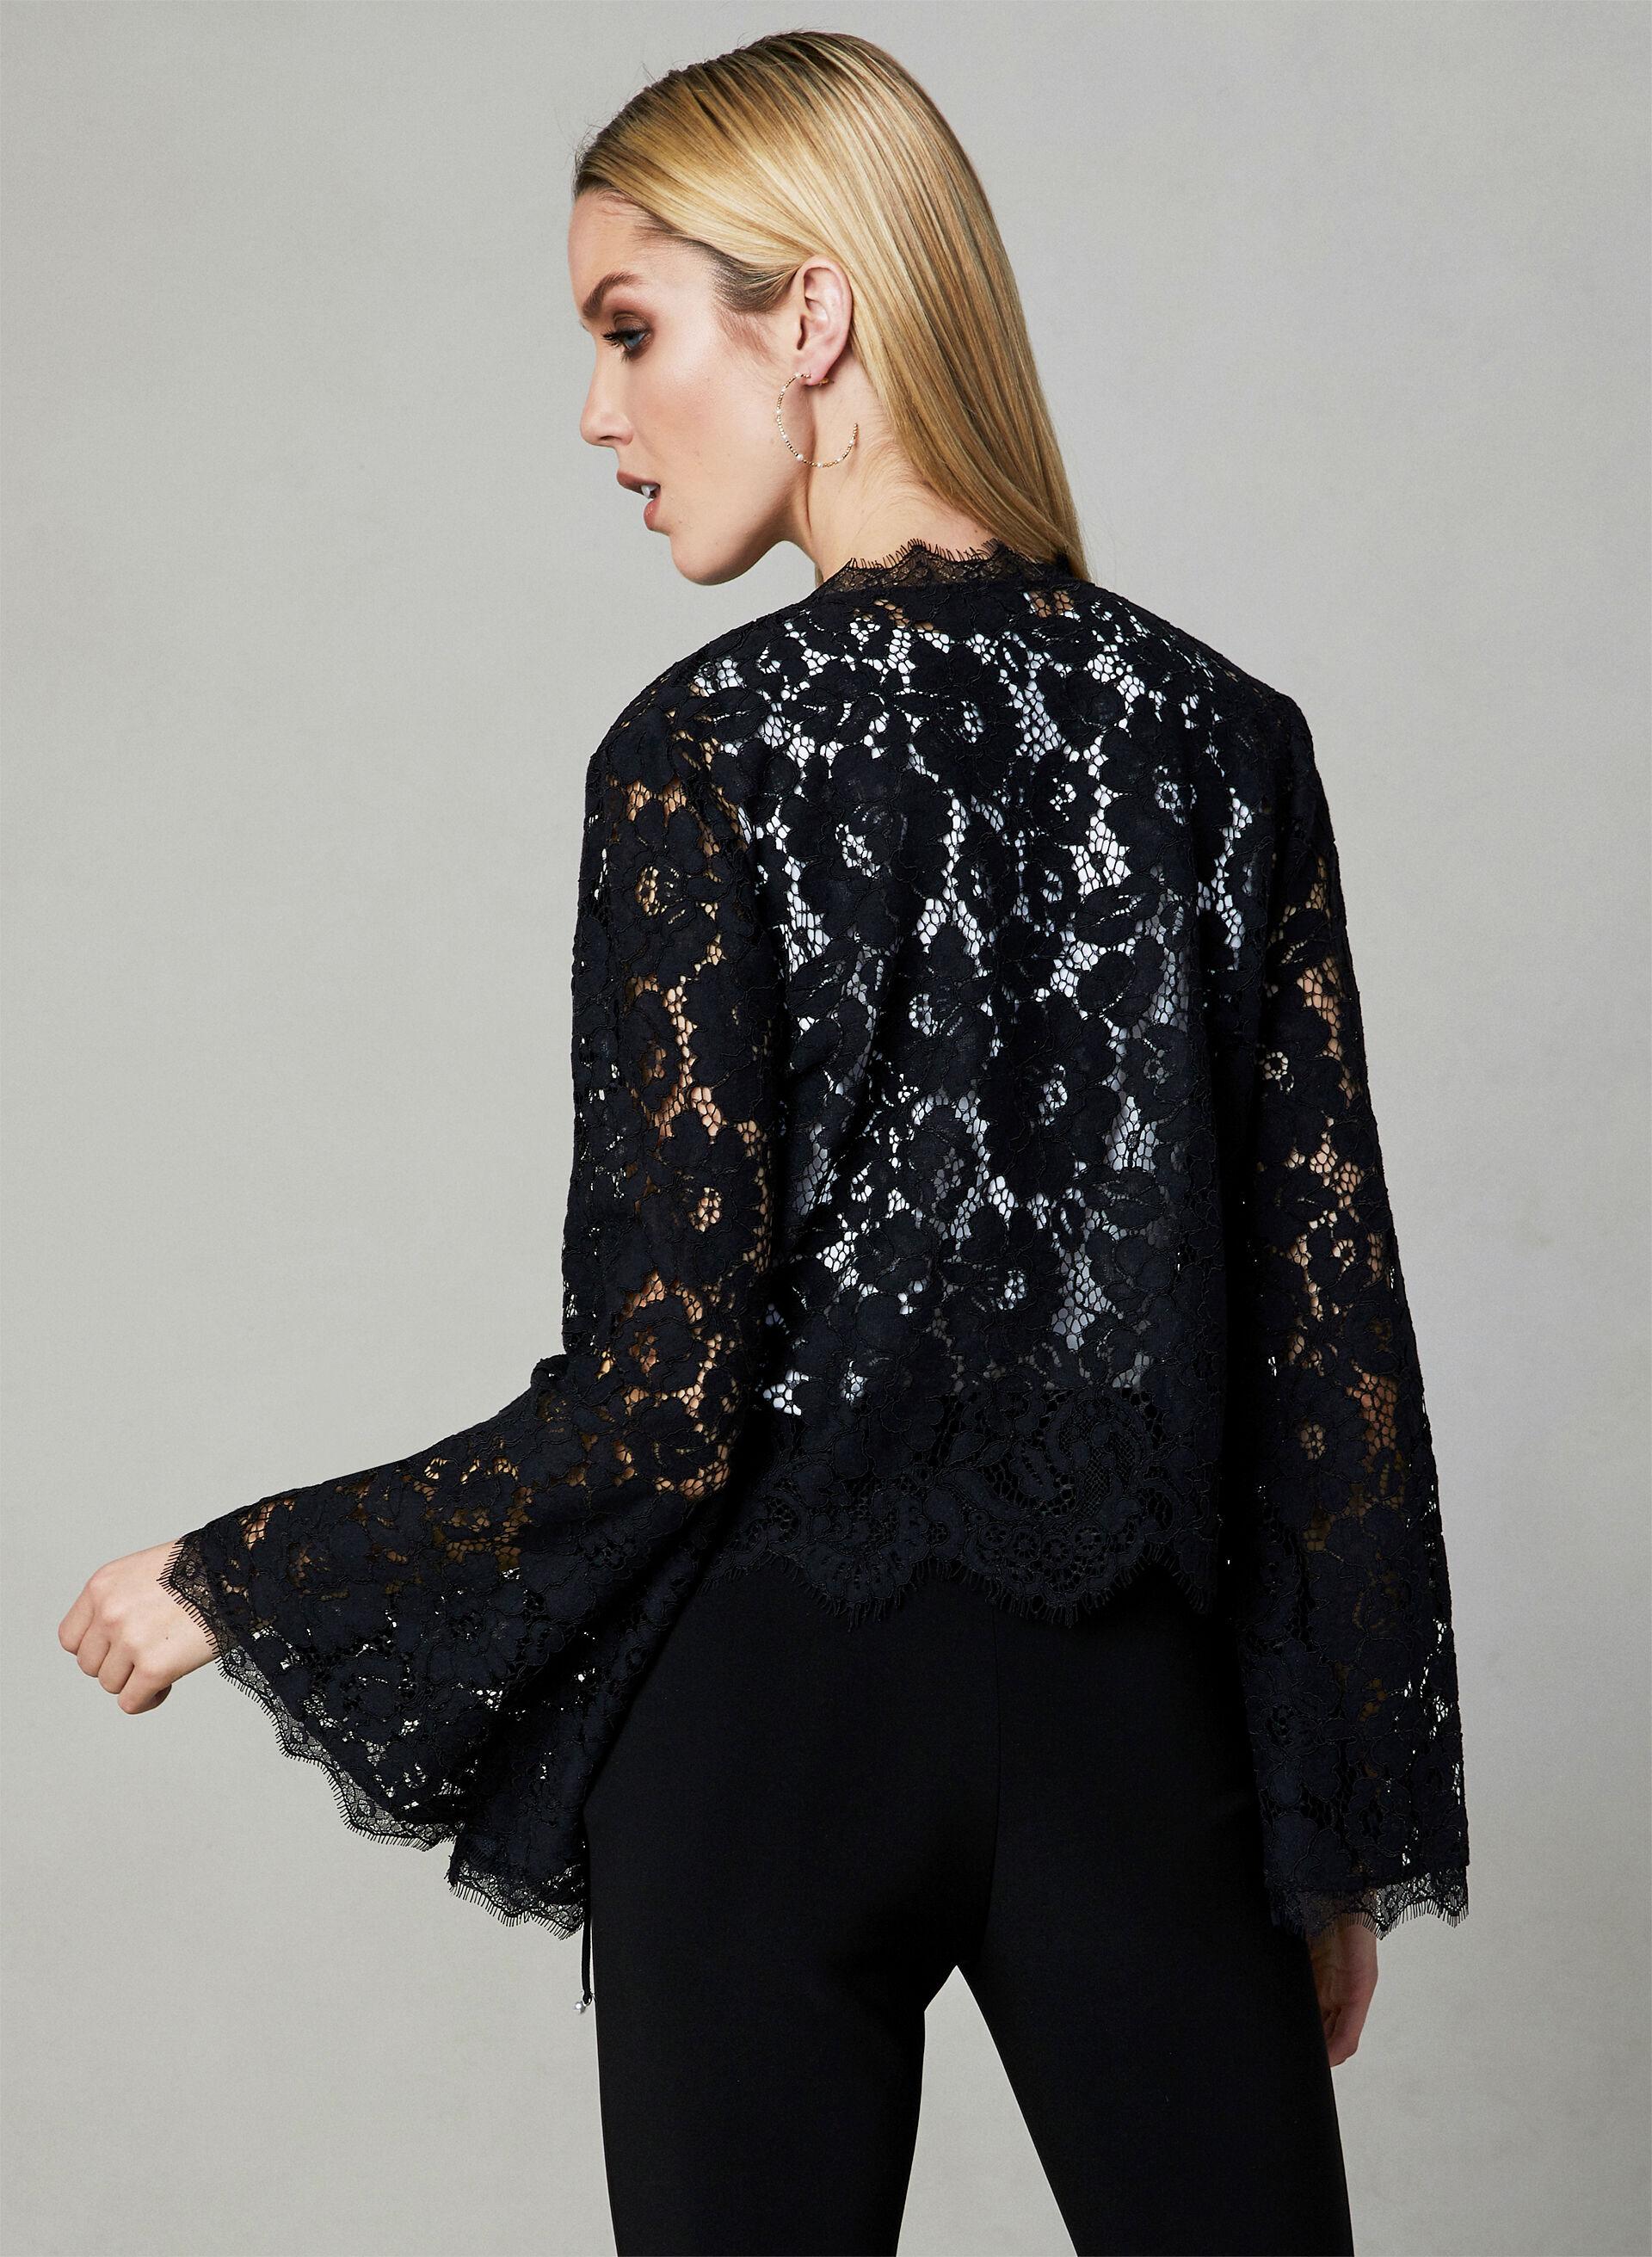 joseph ribkoff bolero fashion dresses